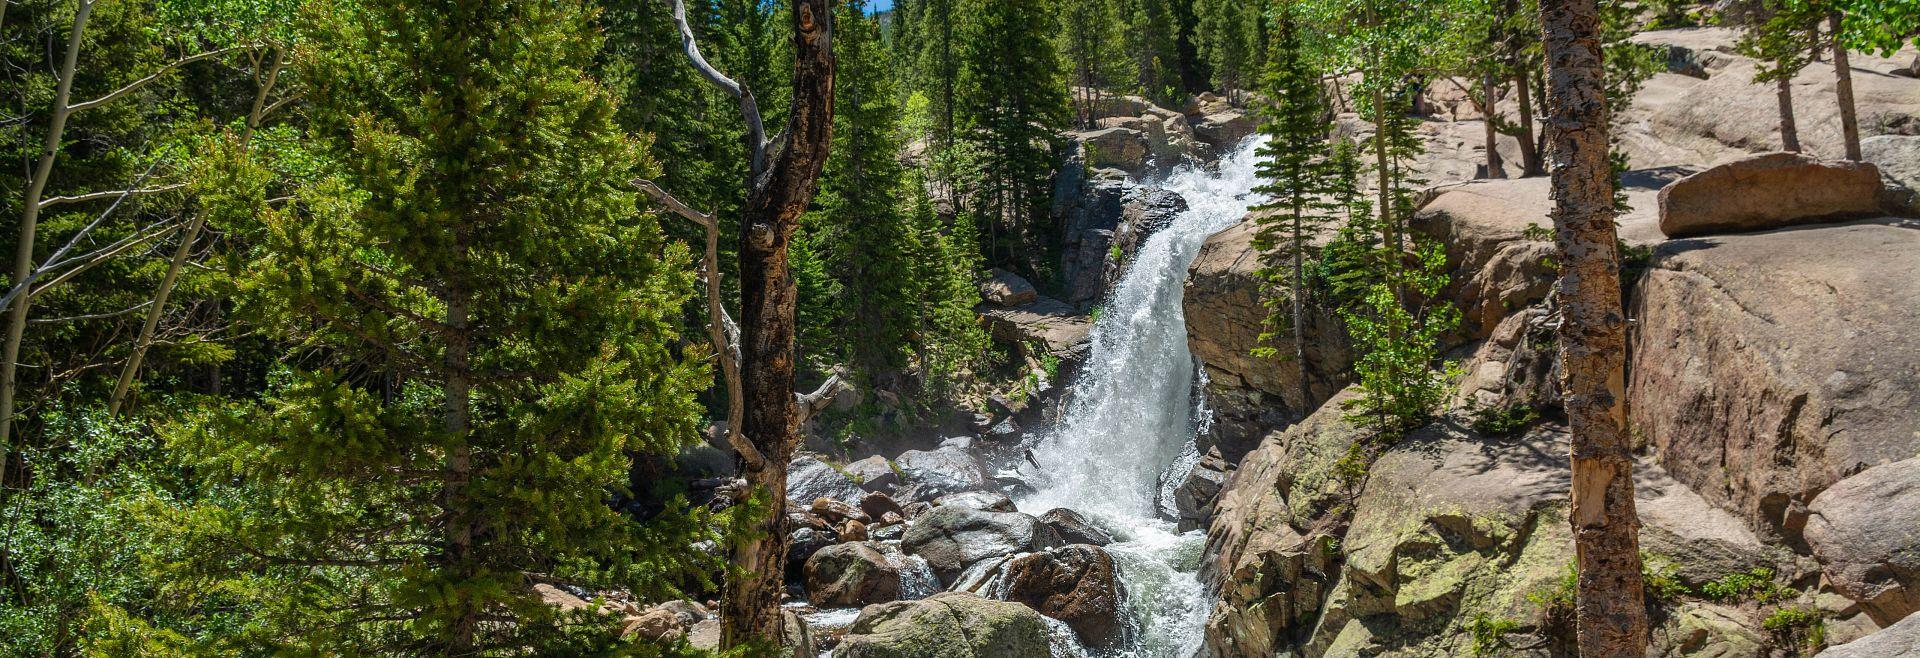 Alberta Falls in the Colorado mountains